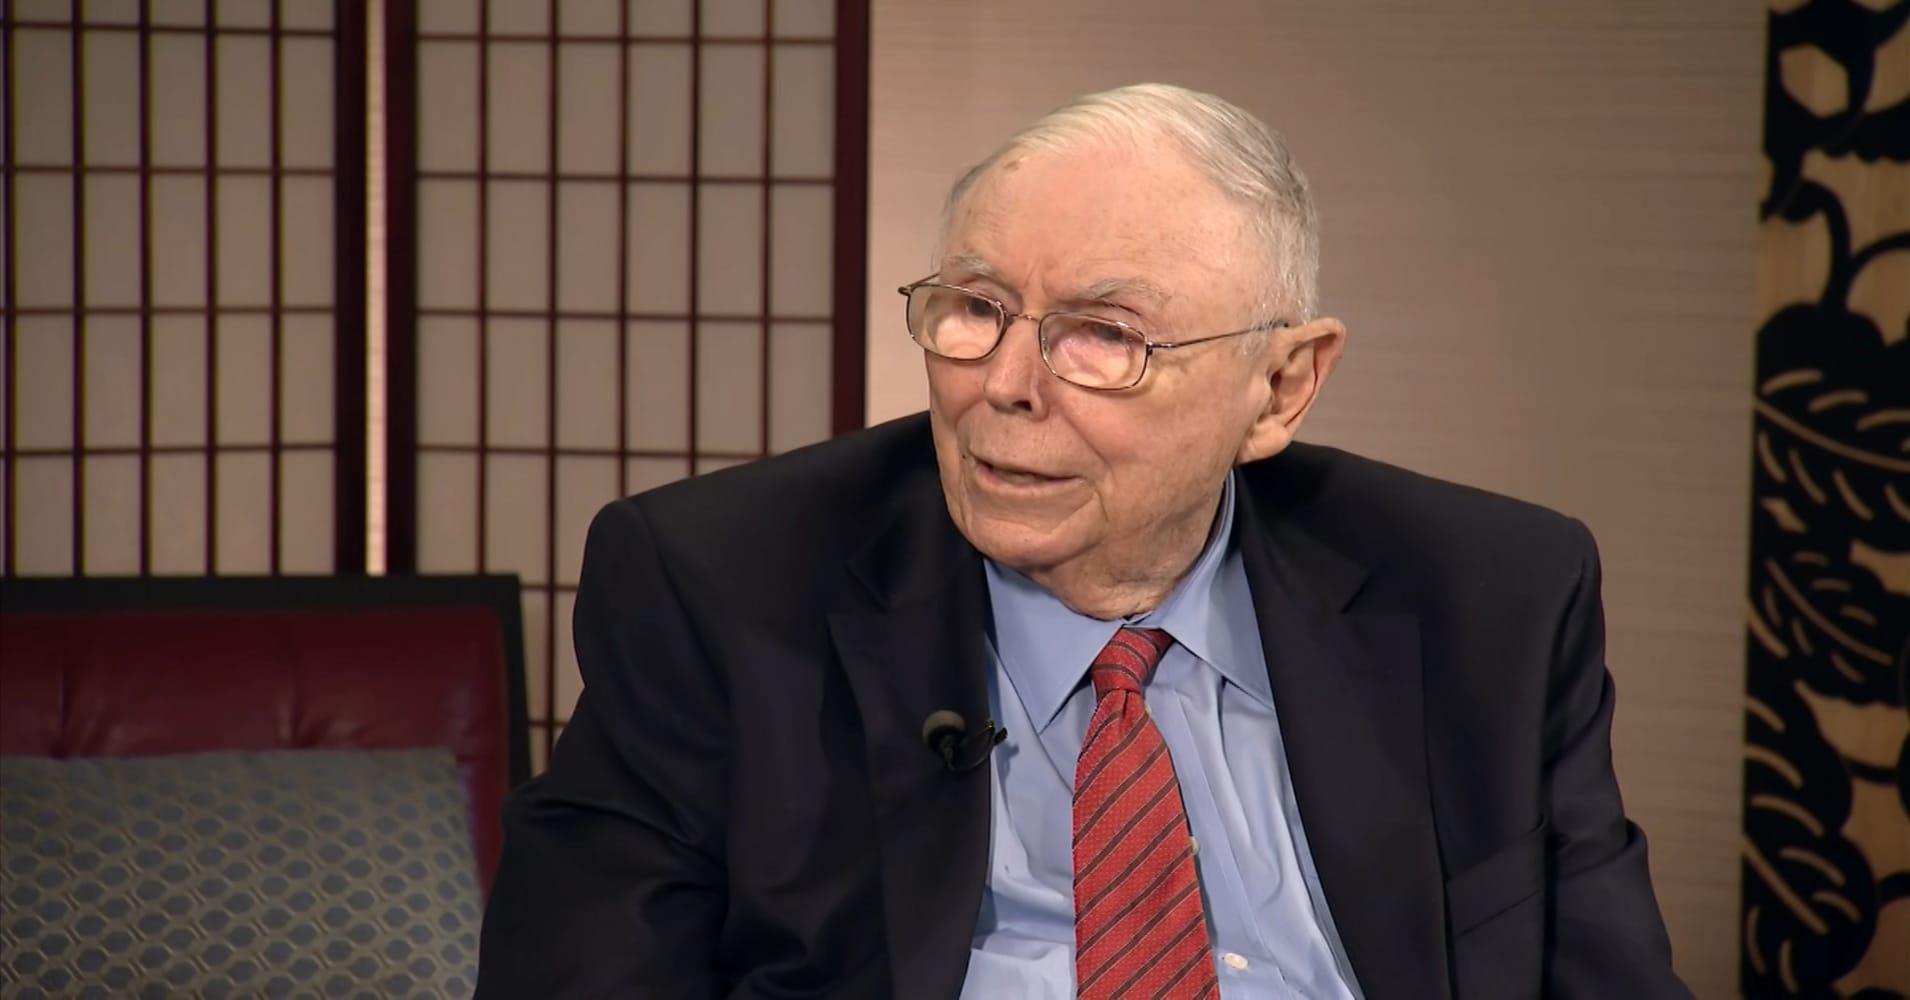 Warren Buffett's right hand man Charlie Munger says Amazon is 'an utter phenomenon of nature'